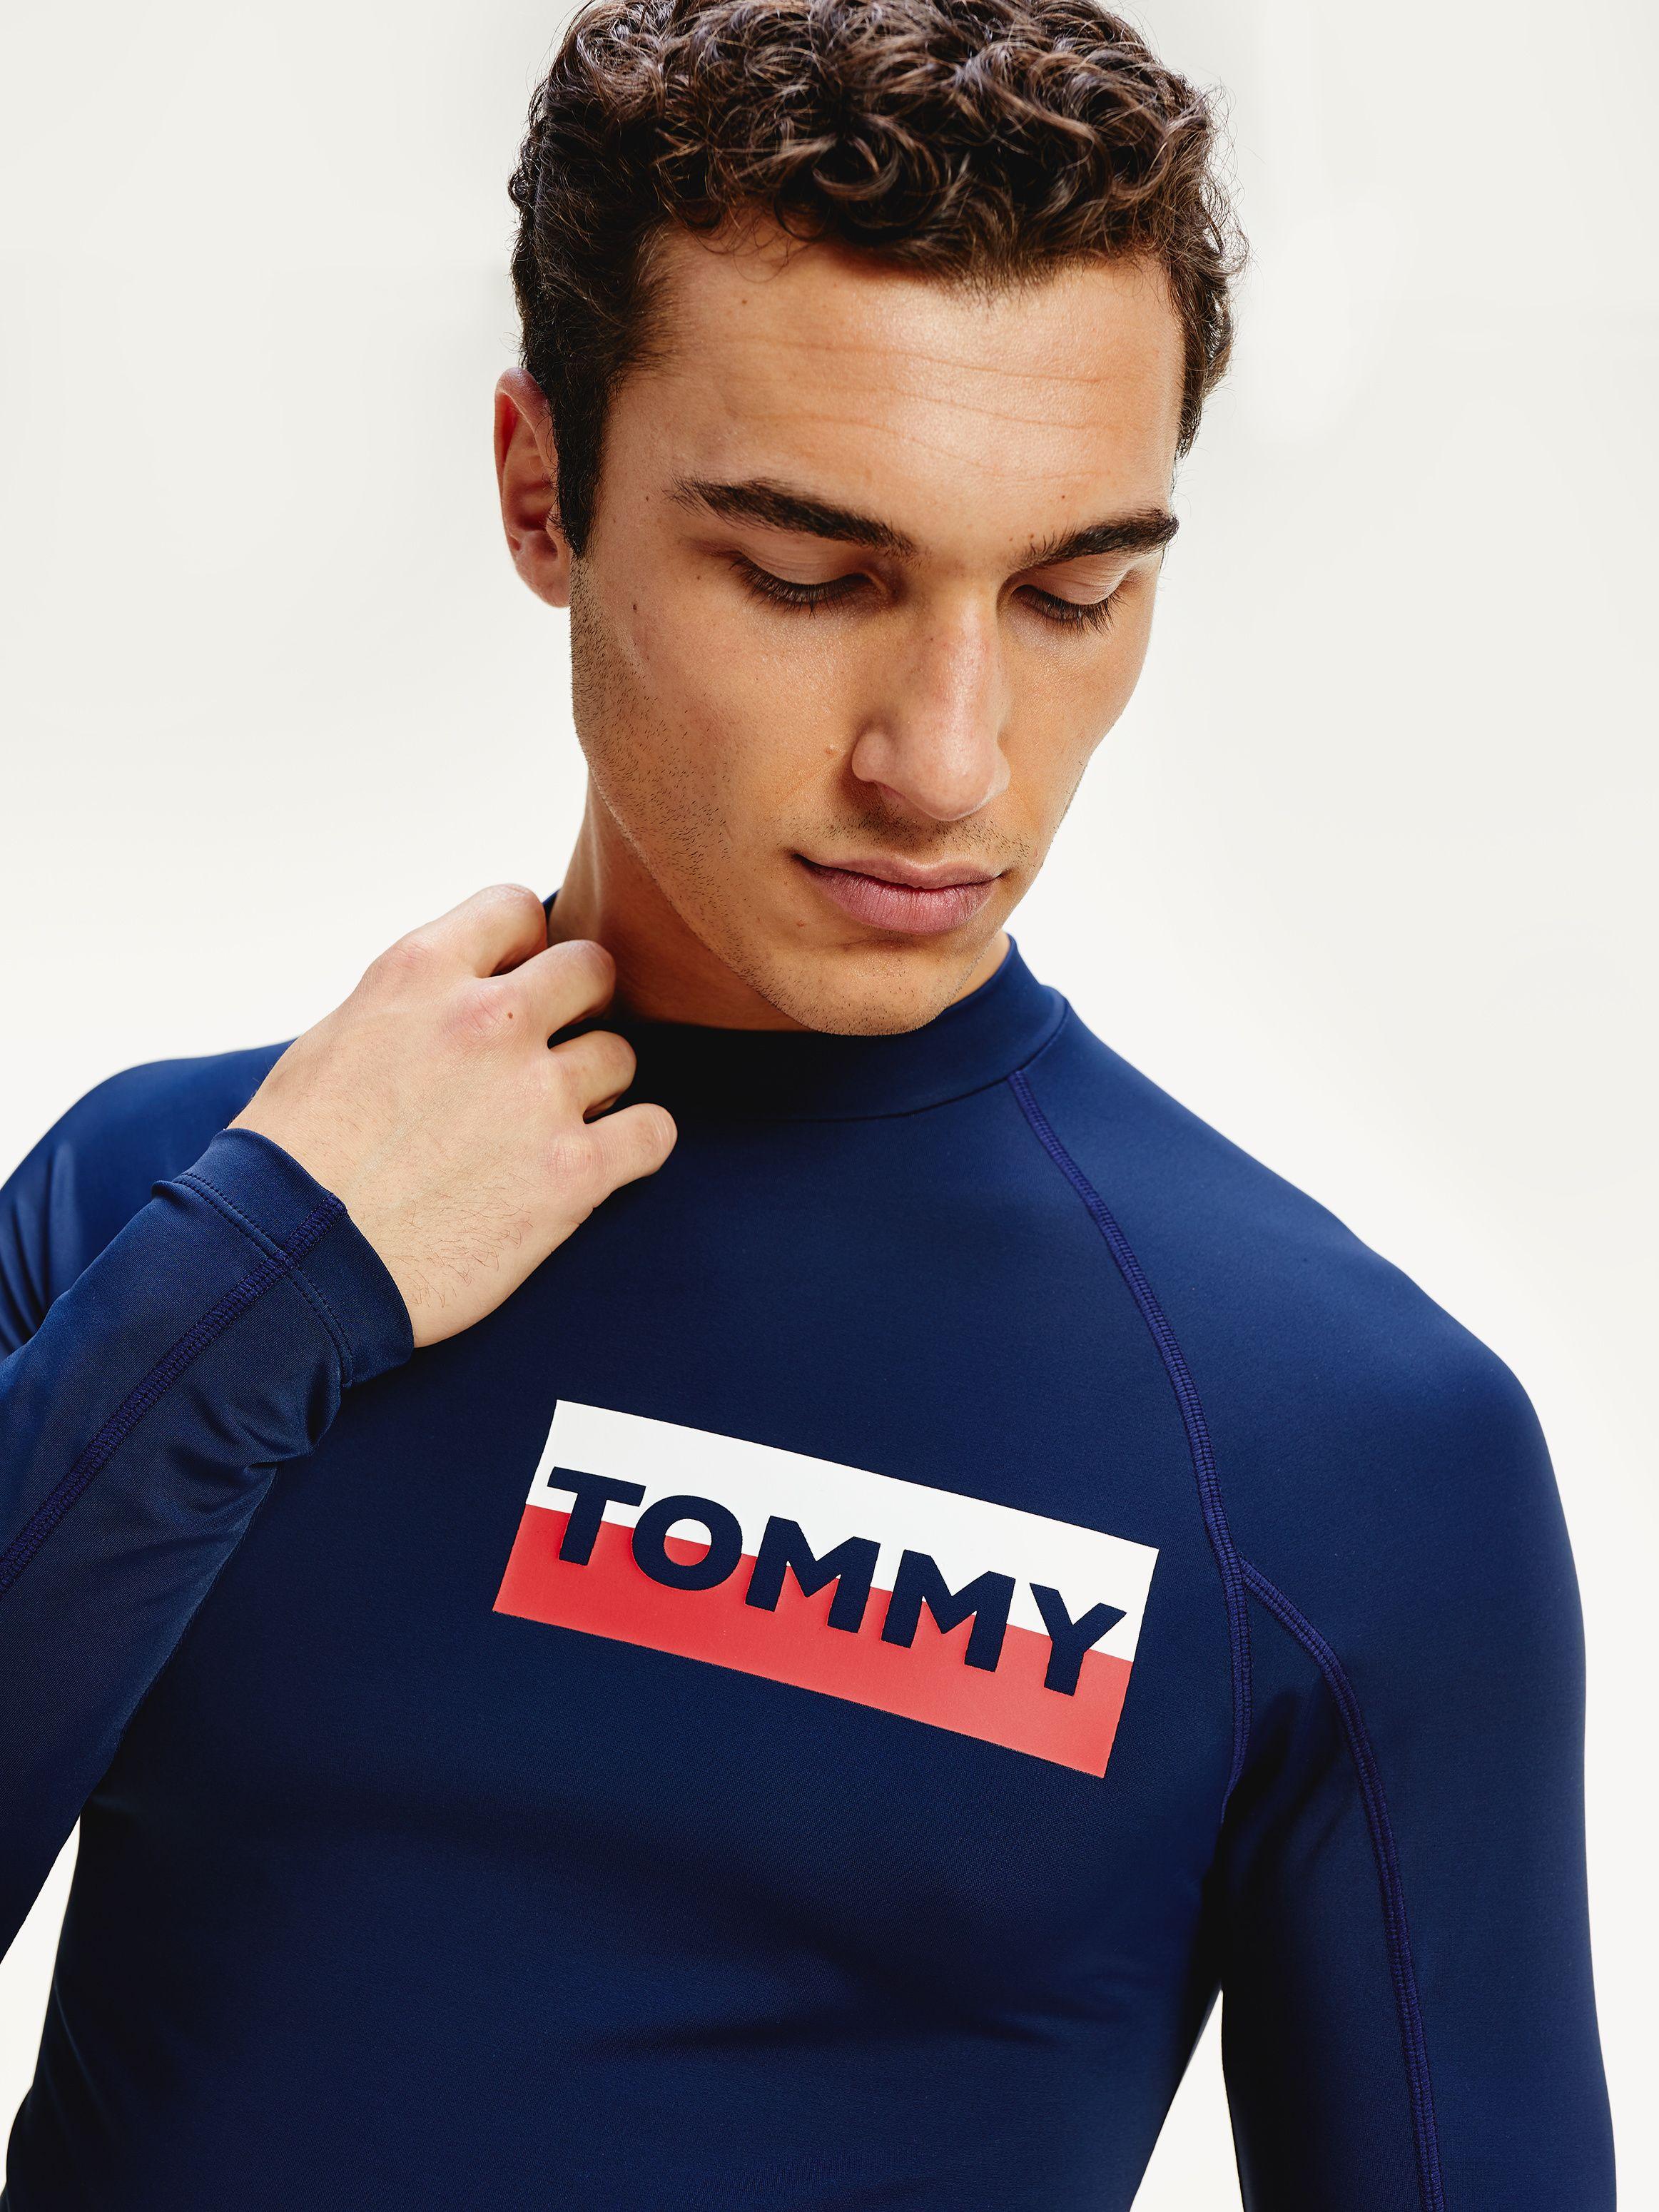 Tommy Hilfiger Mens Rash Guard Long Sleeve